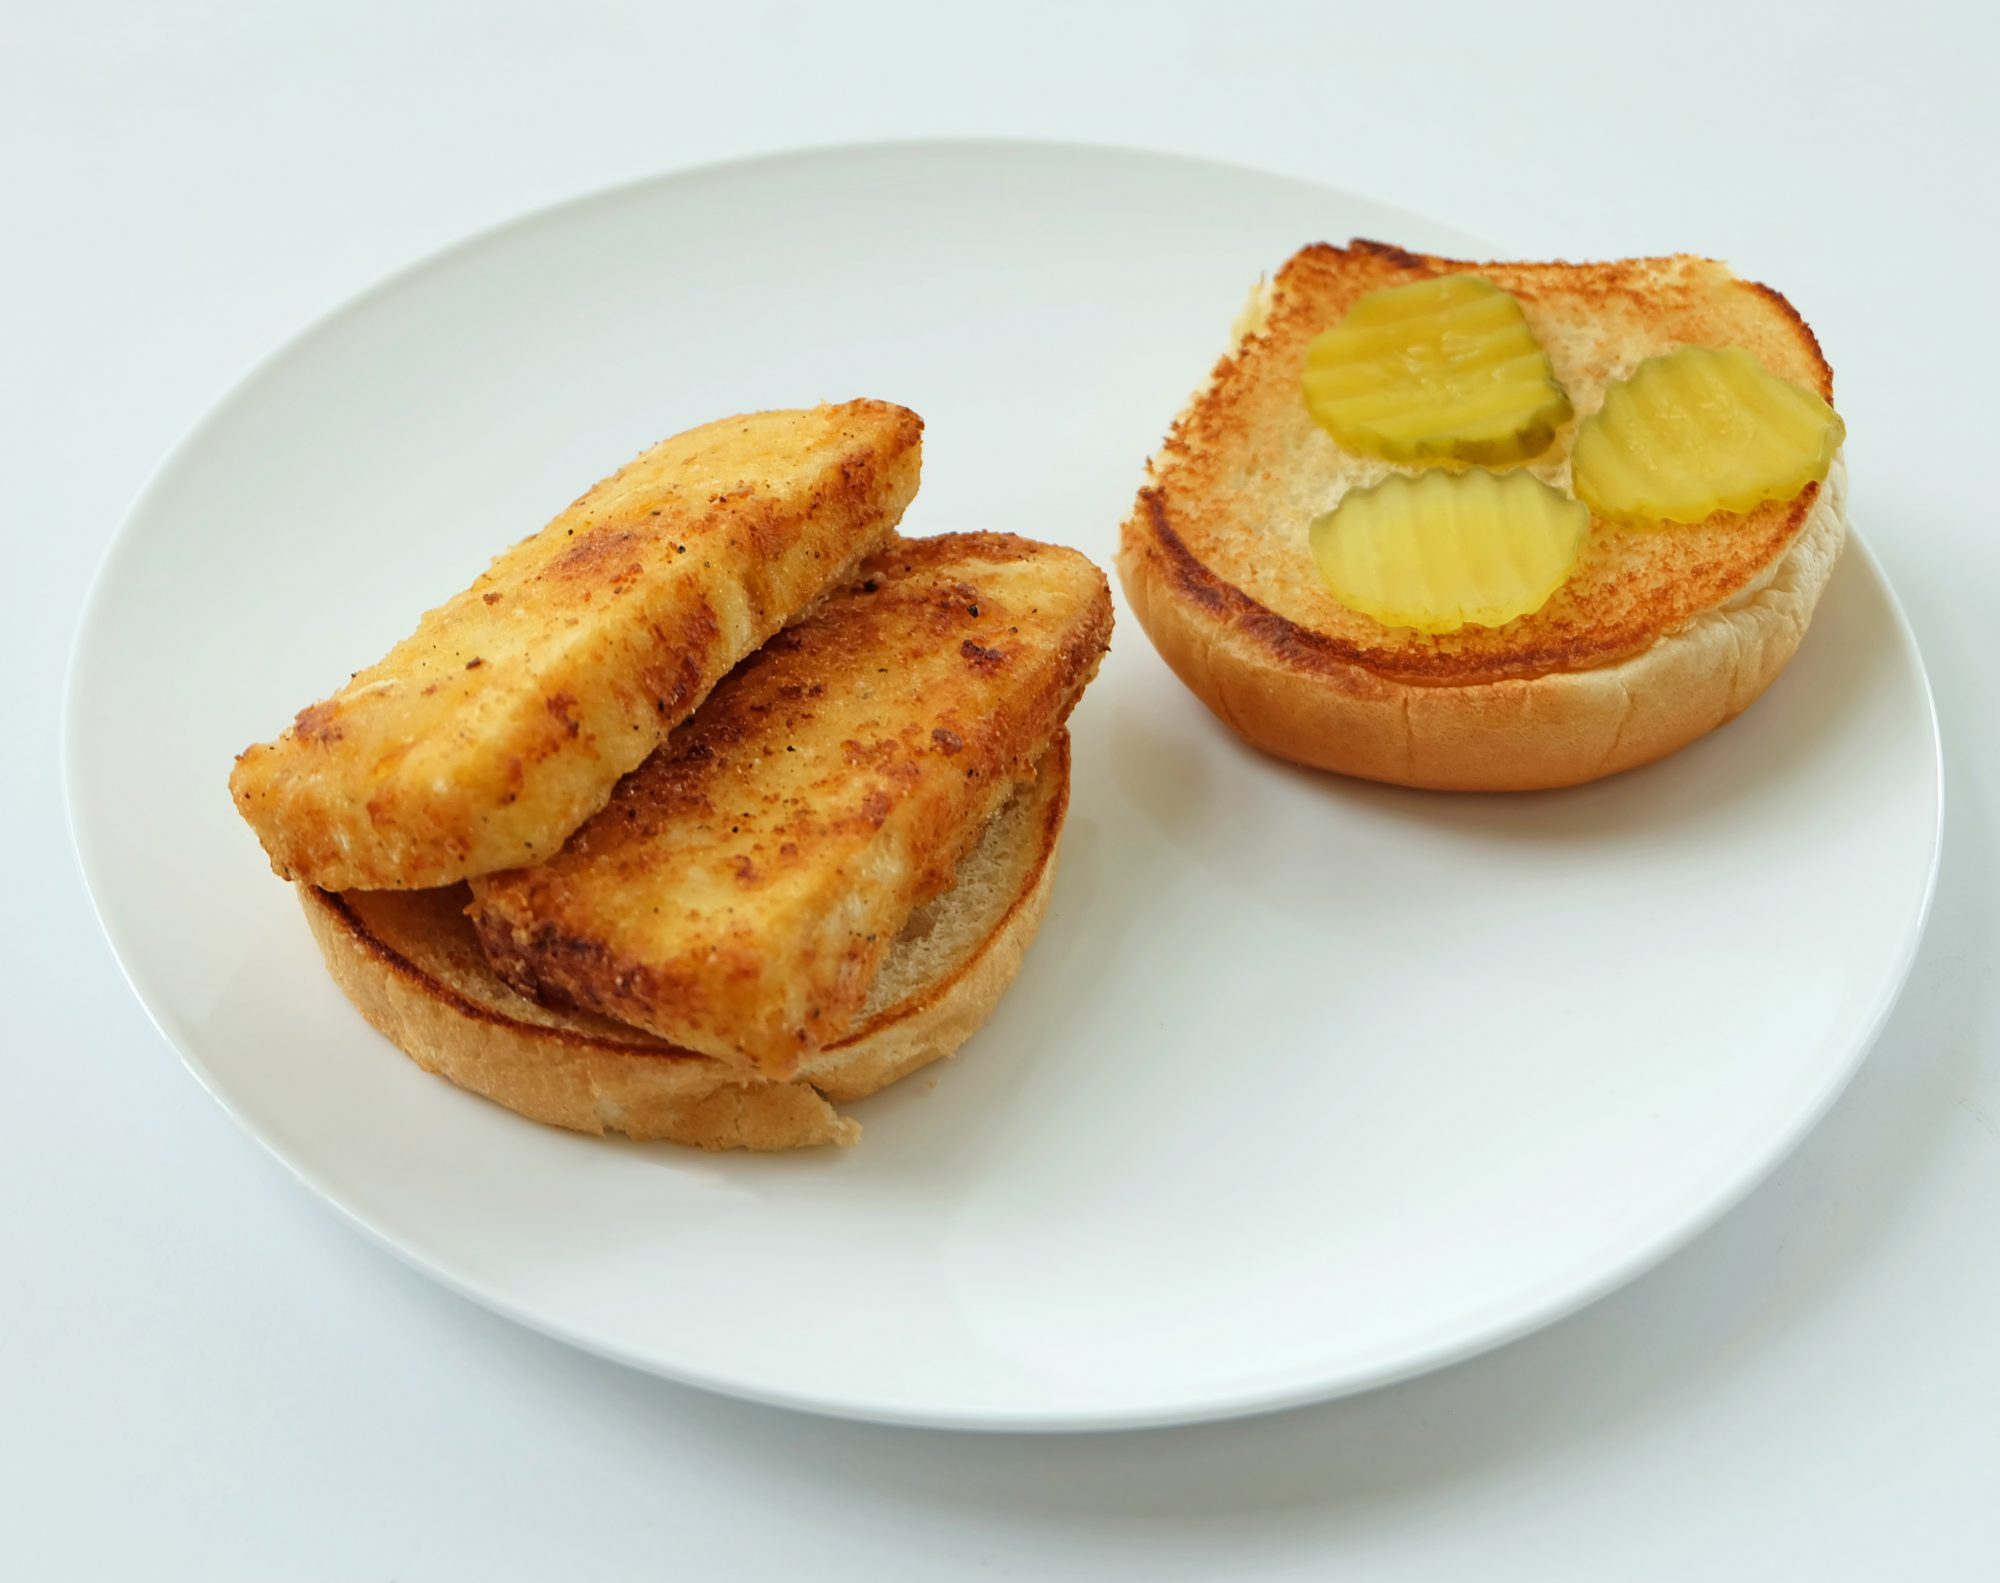 Vegan Copycat: Chick-fil-A Sandwich